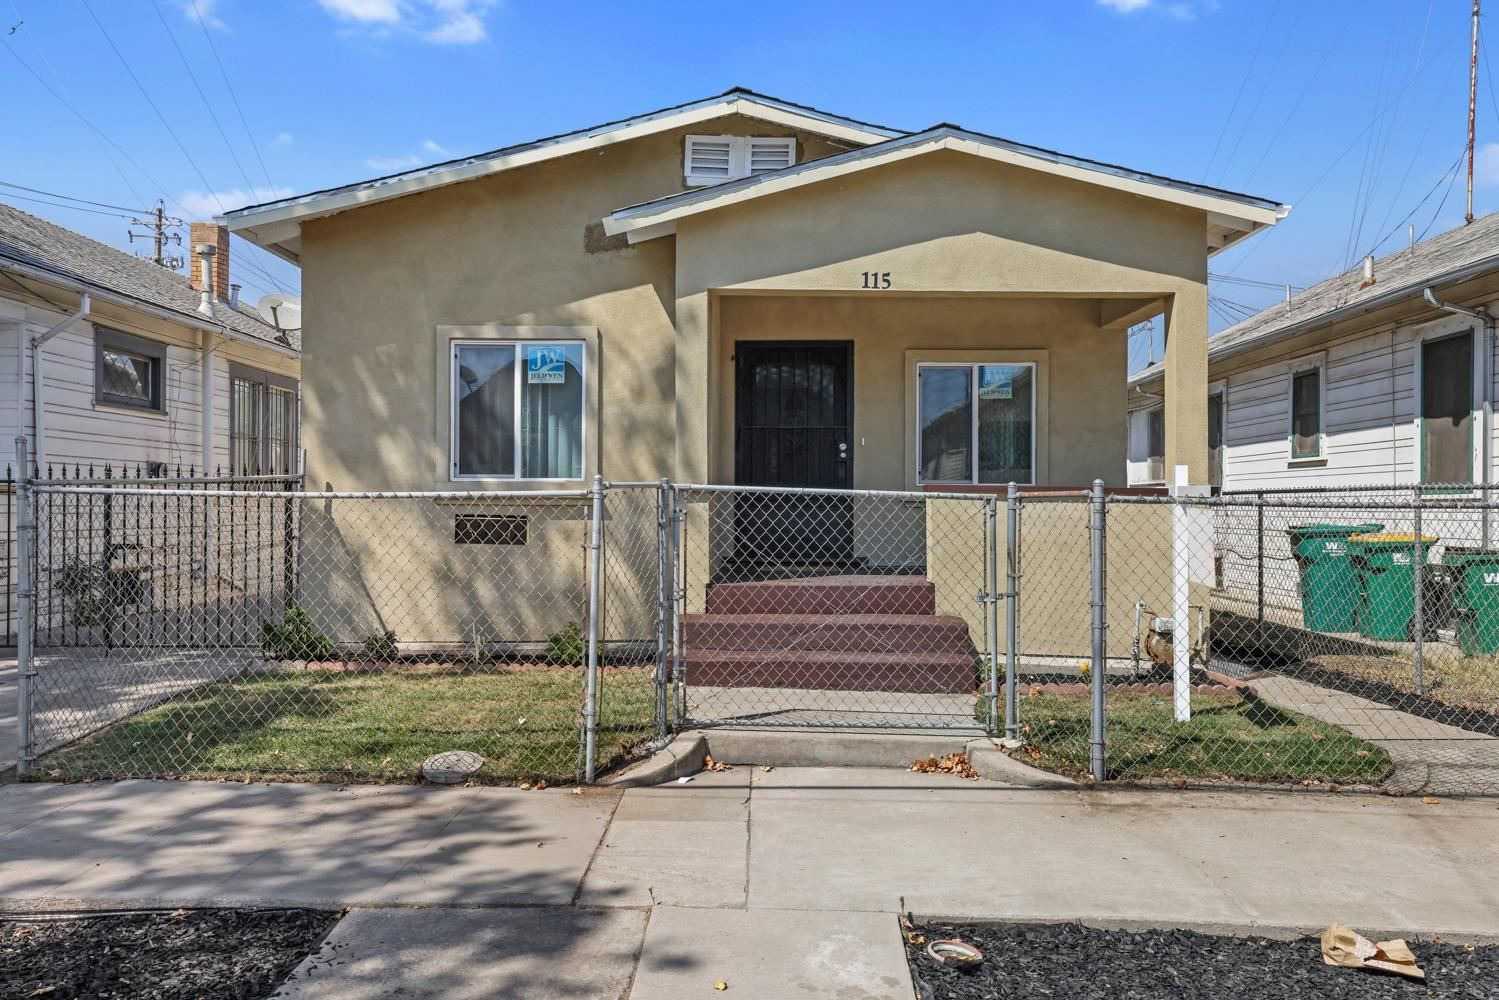 115 Jackson Street, Stockton, CA 95206 - MLS#: 221112605